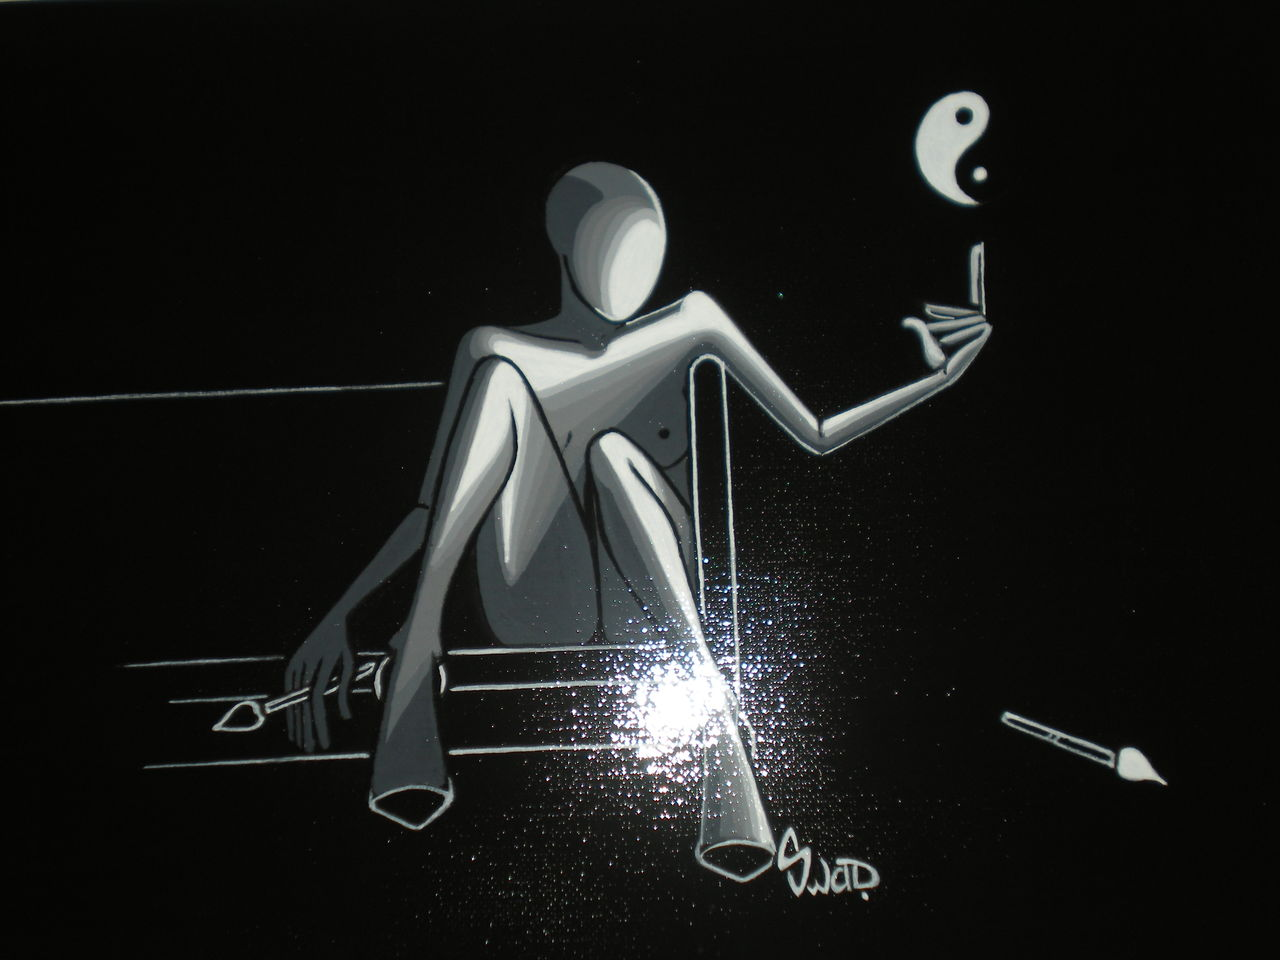 souad halima-rihoum dit SWAD en tant qu'artiste SANS NOM